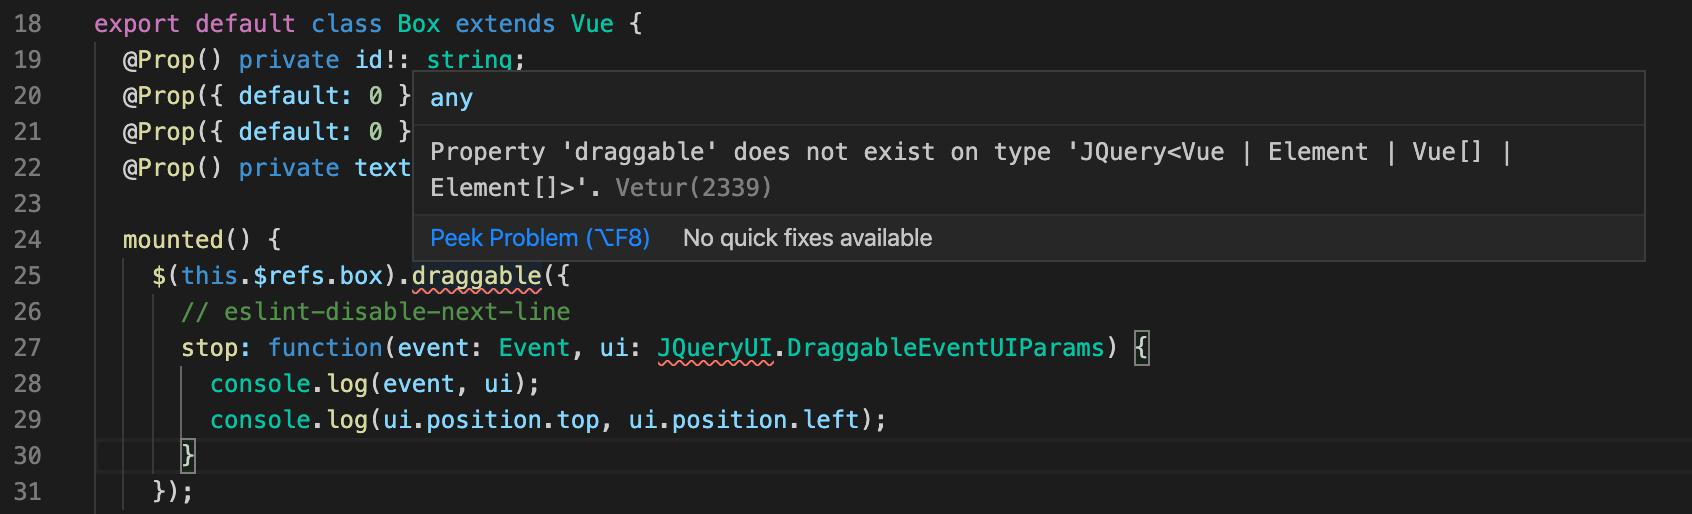 VSCodeでjquery-uiの型が参照できない